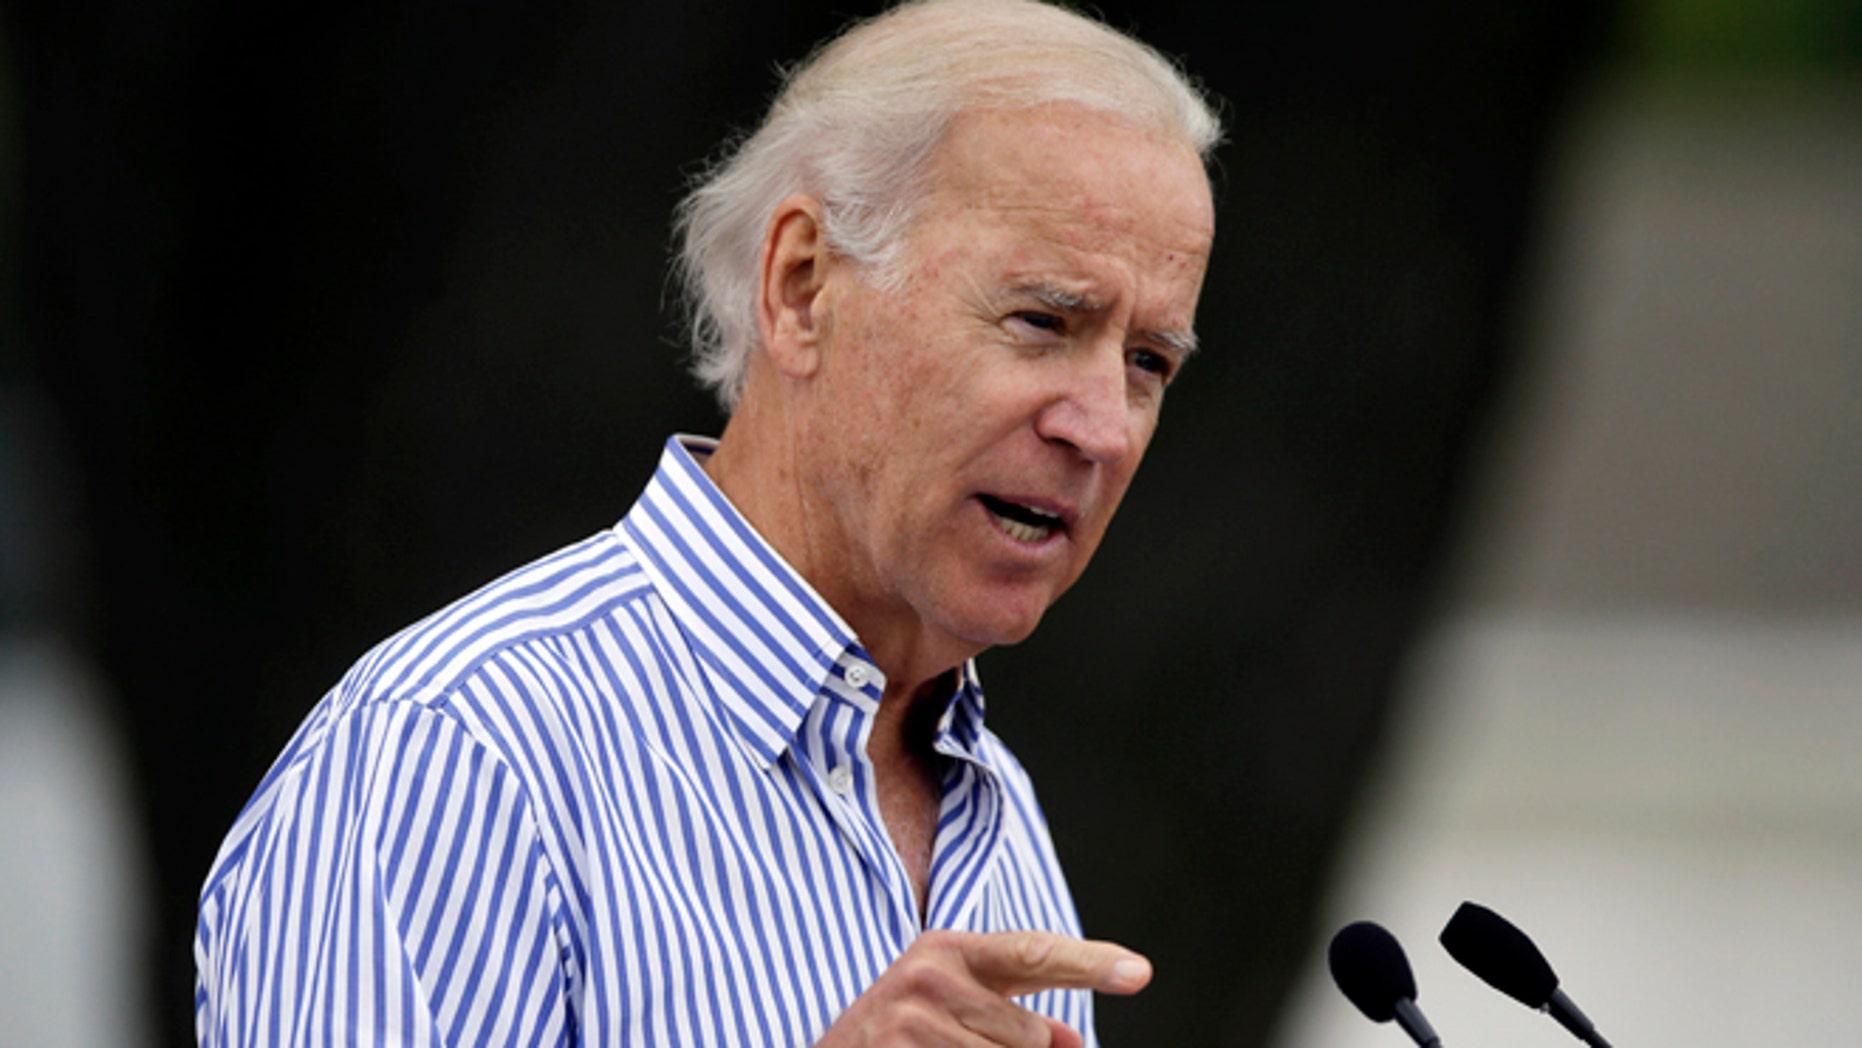 Sept. 15, 2013: Vice President Joe Biden speaks during Iowa Sen. Tom Harkin's annual fundraising steak fry dinner in Indianola, Iowa.